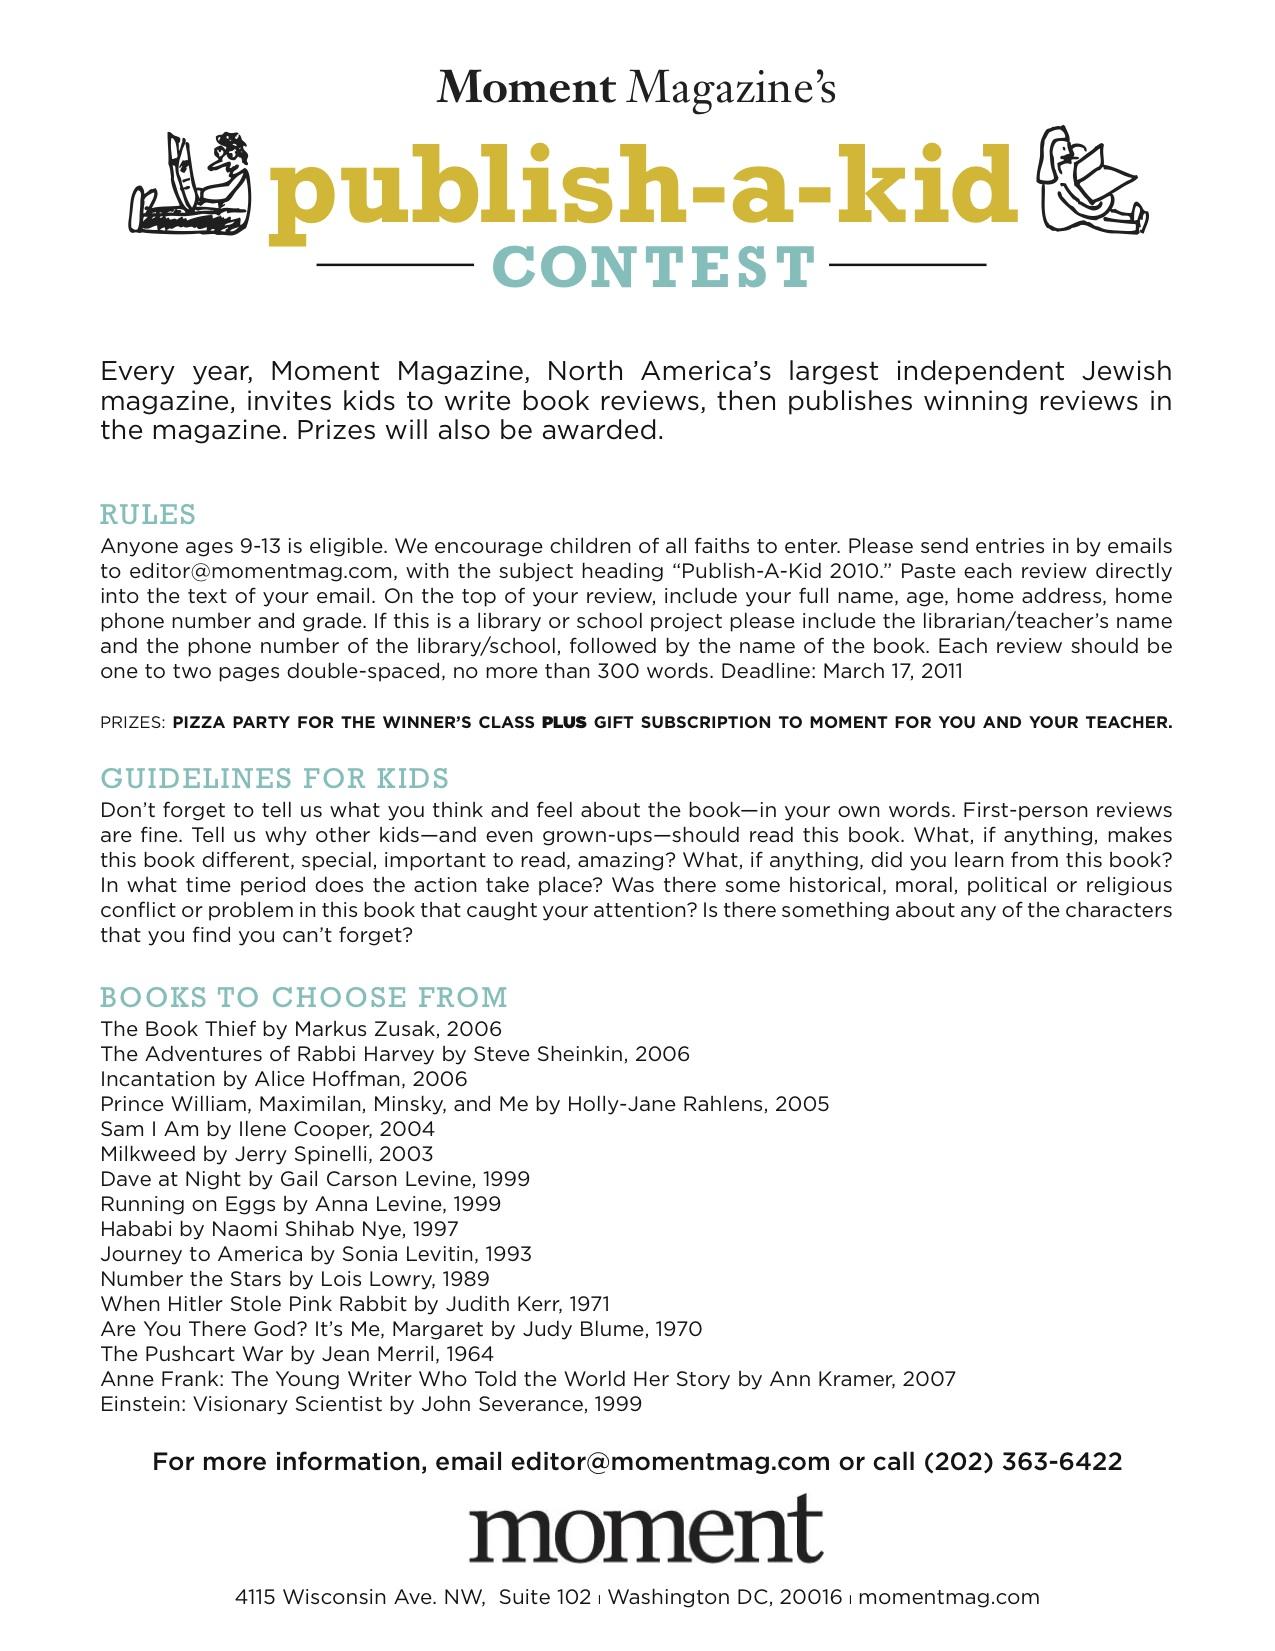 Moment's Publish-a-Kid Contest